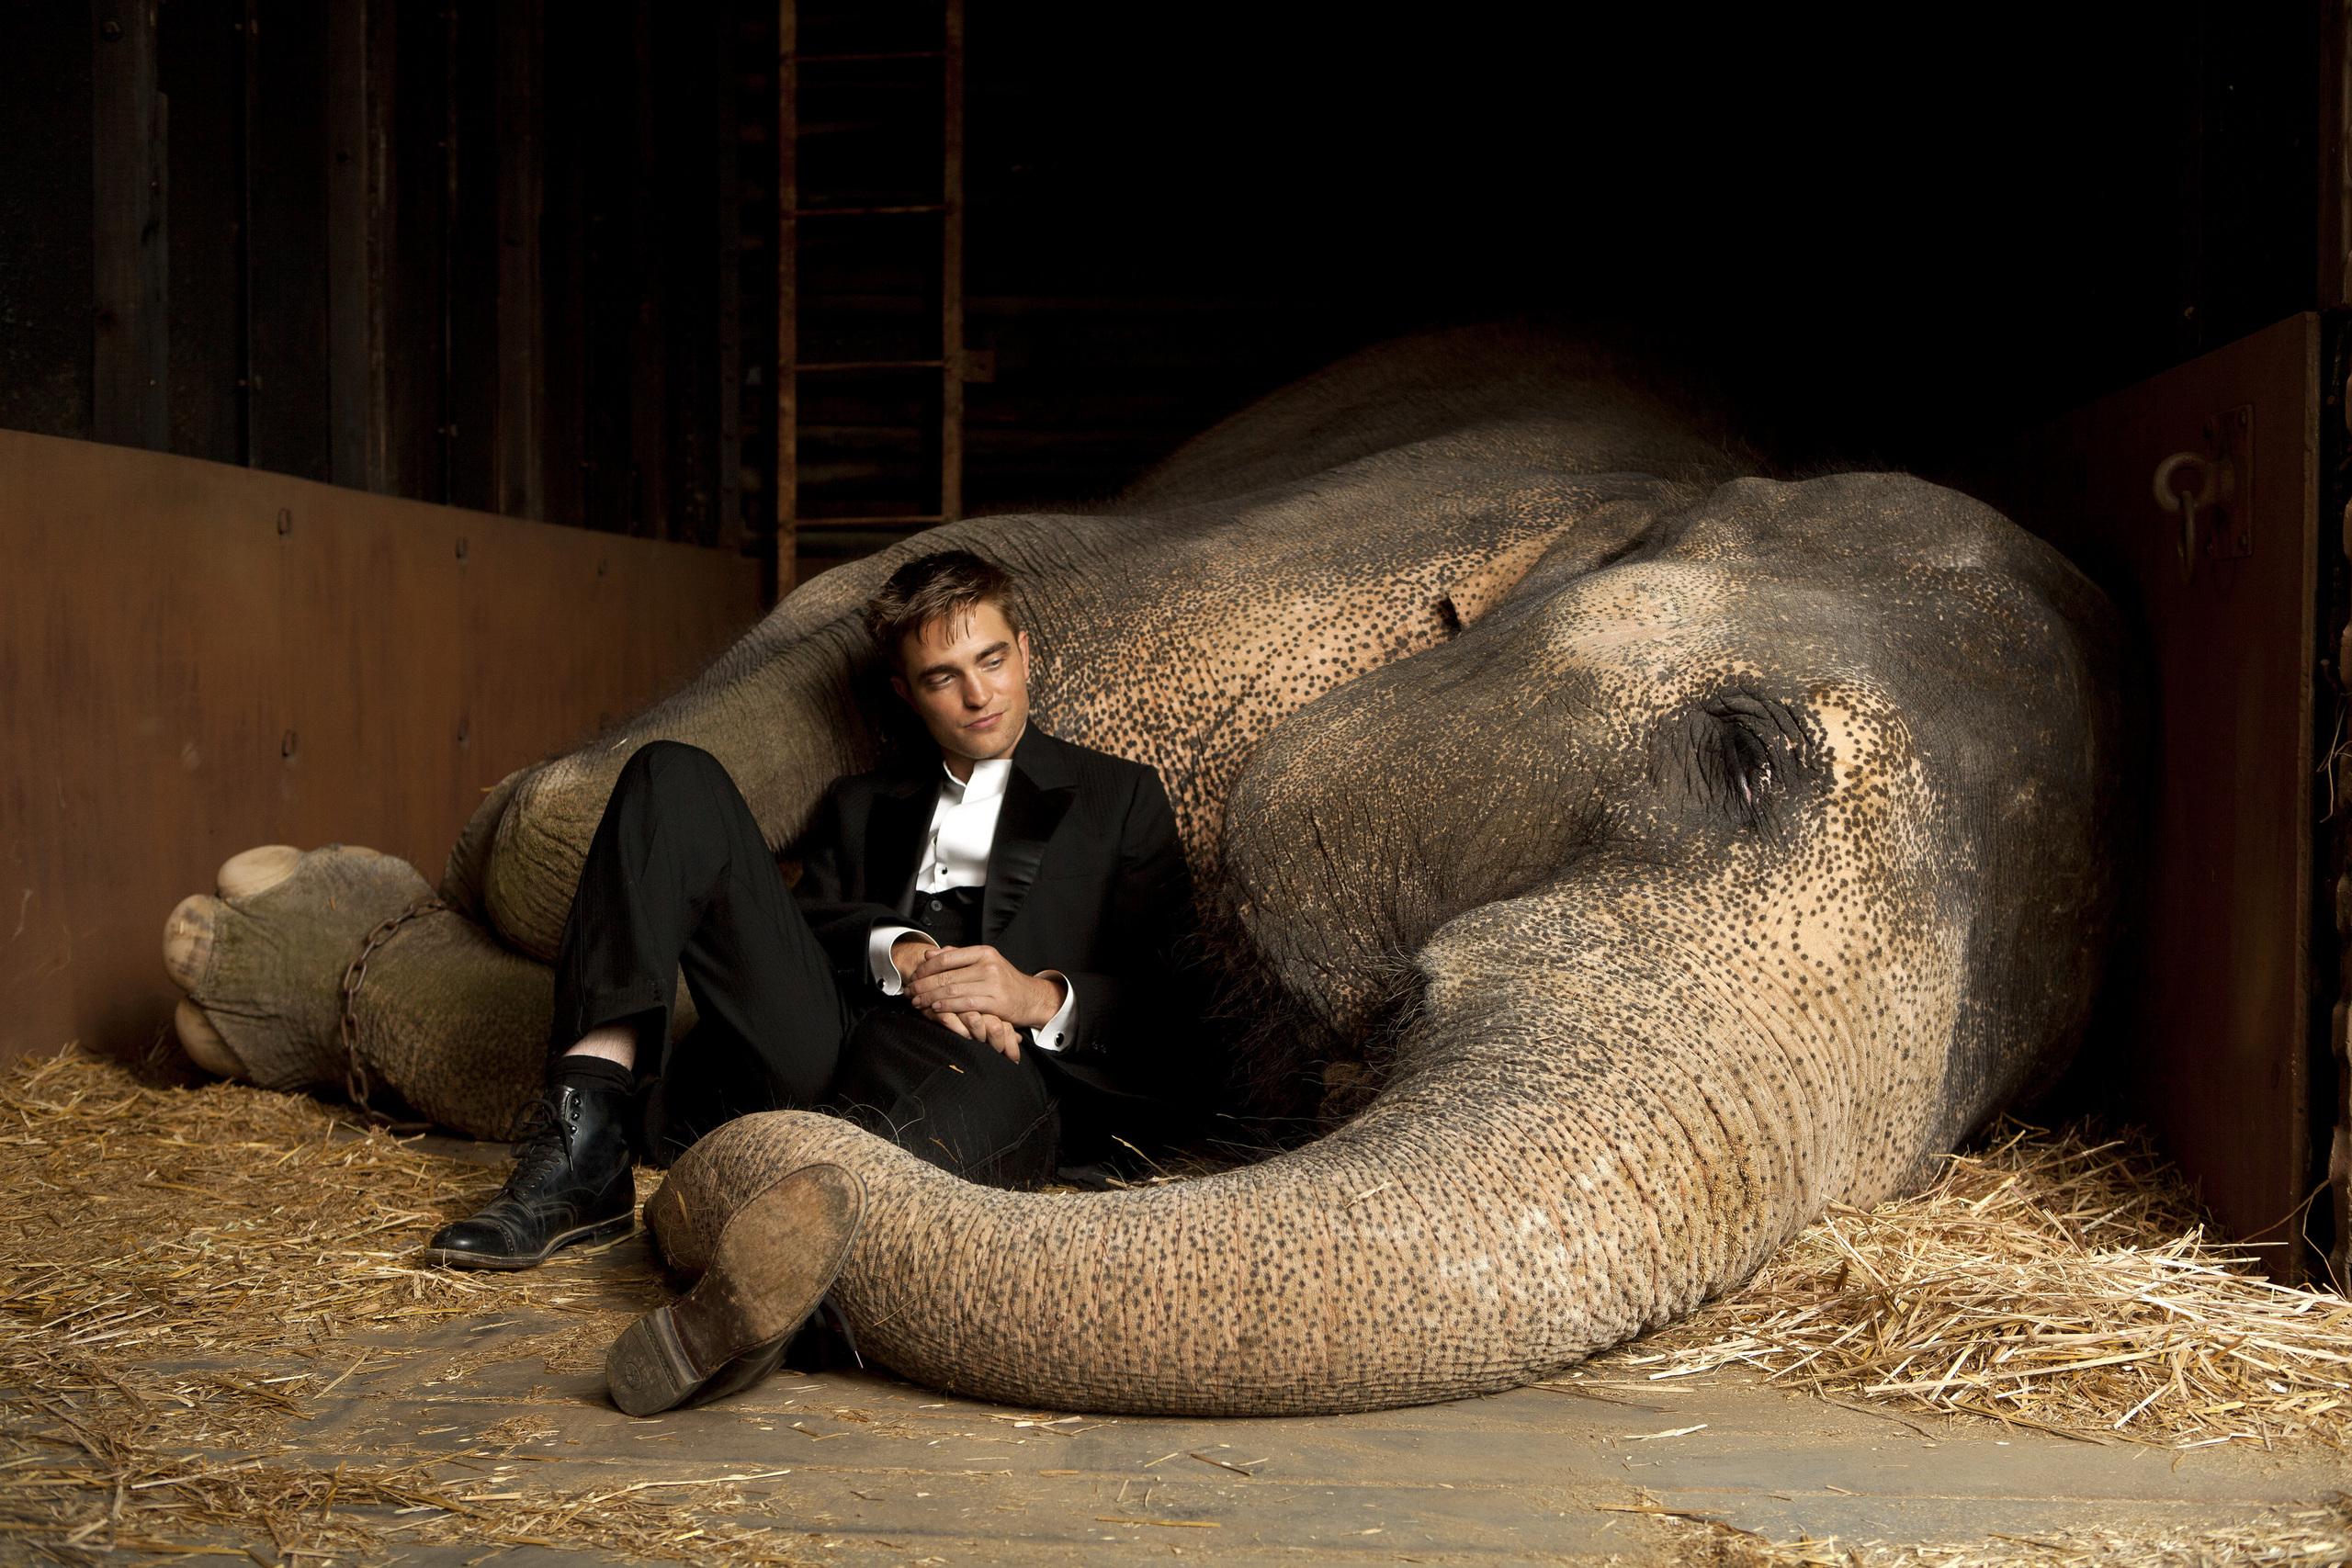 Water for elephants essay